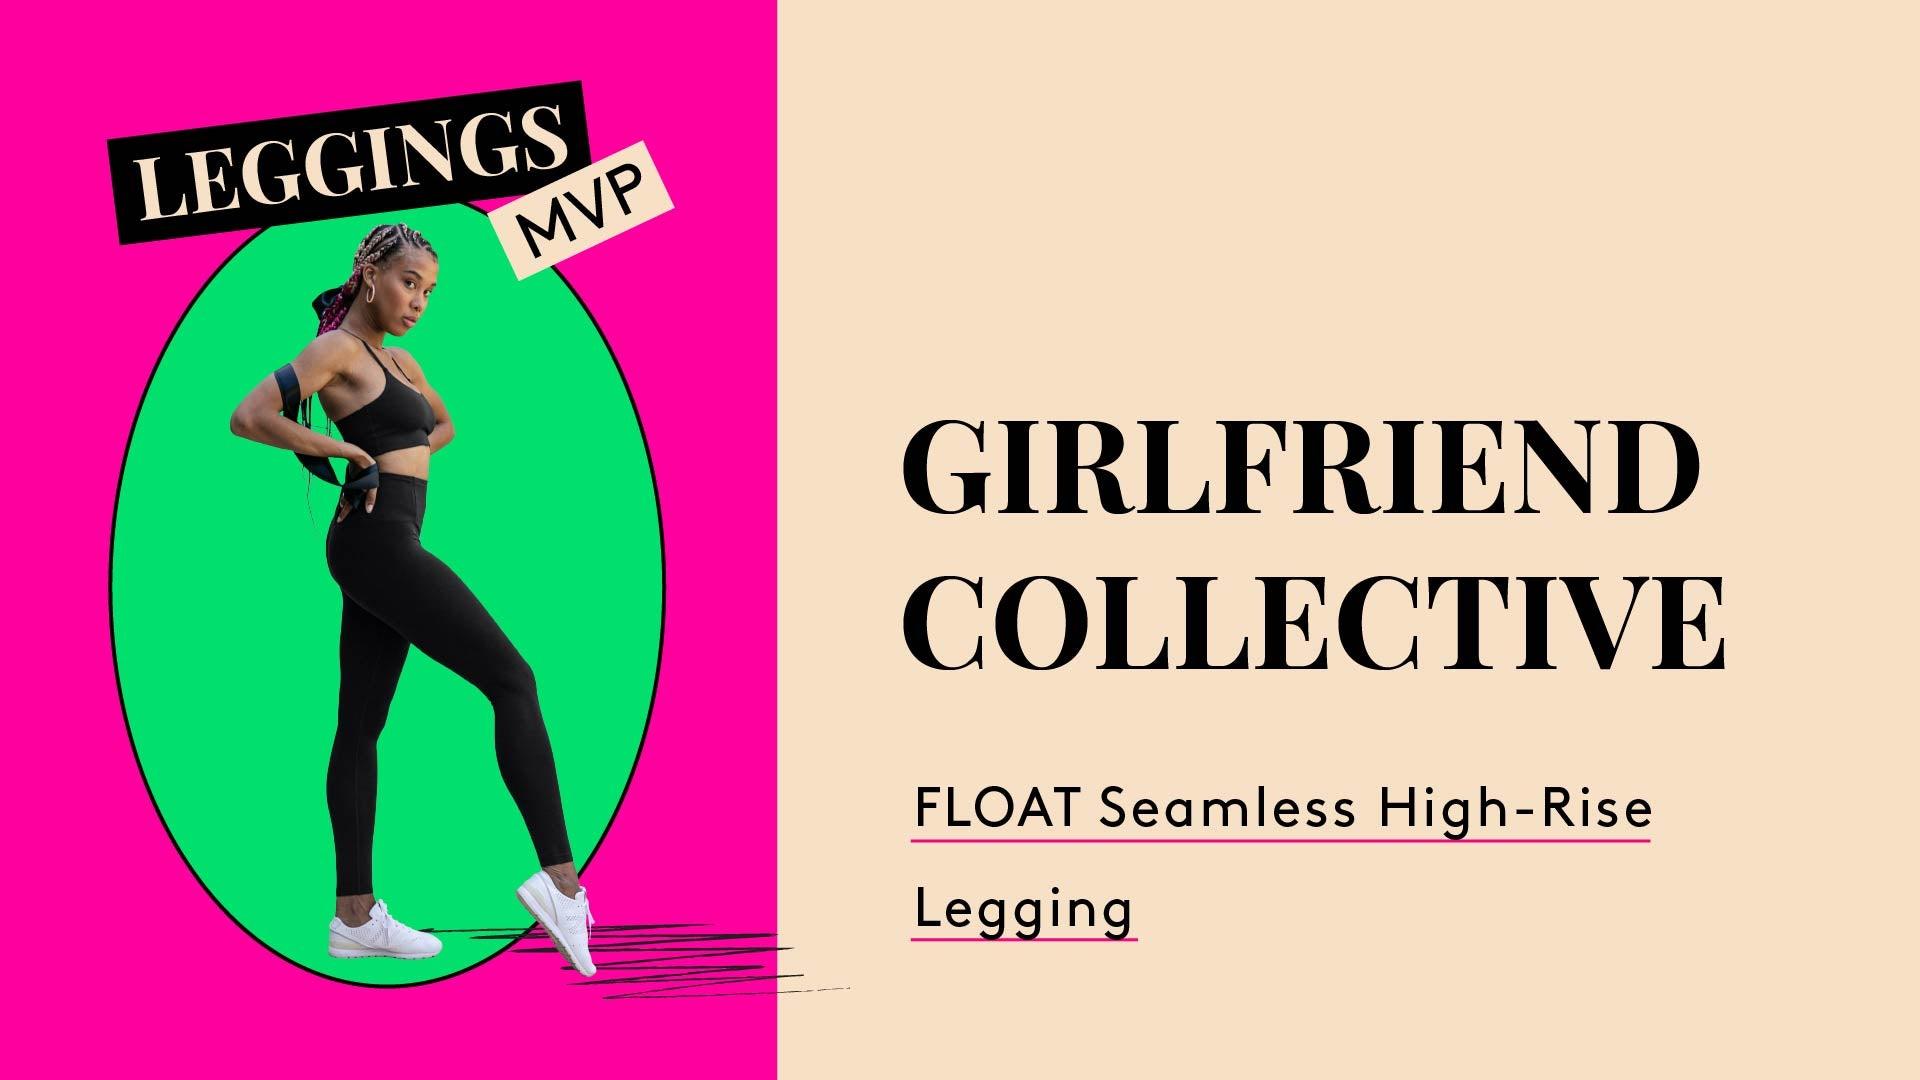 Leggings MPV. A photo of woman wearing leggings. Girlfriend Collective. Float Seamless High-Rise Legging.